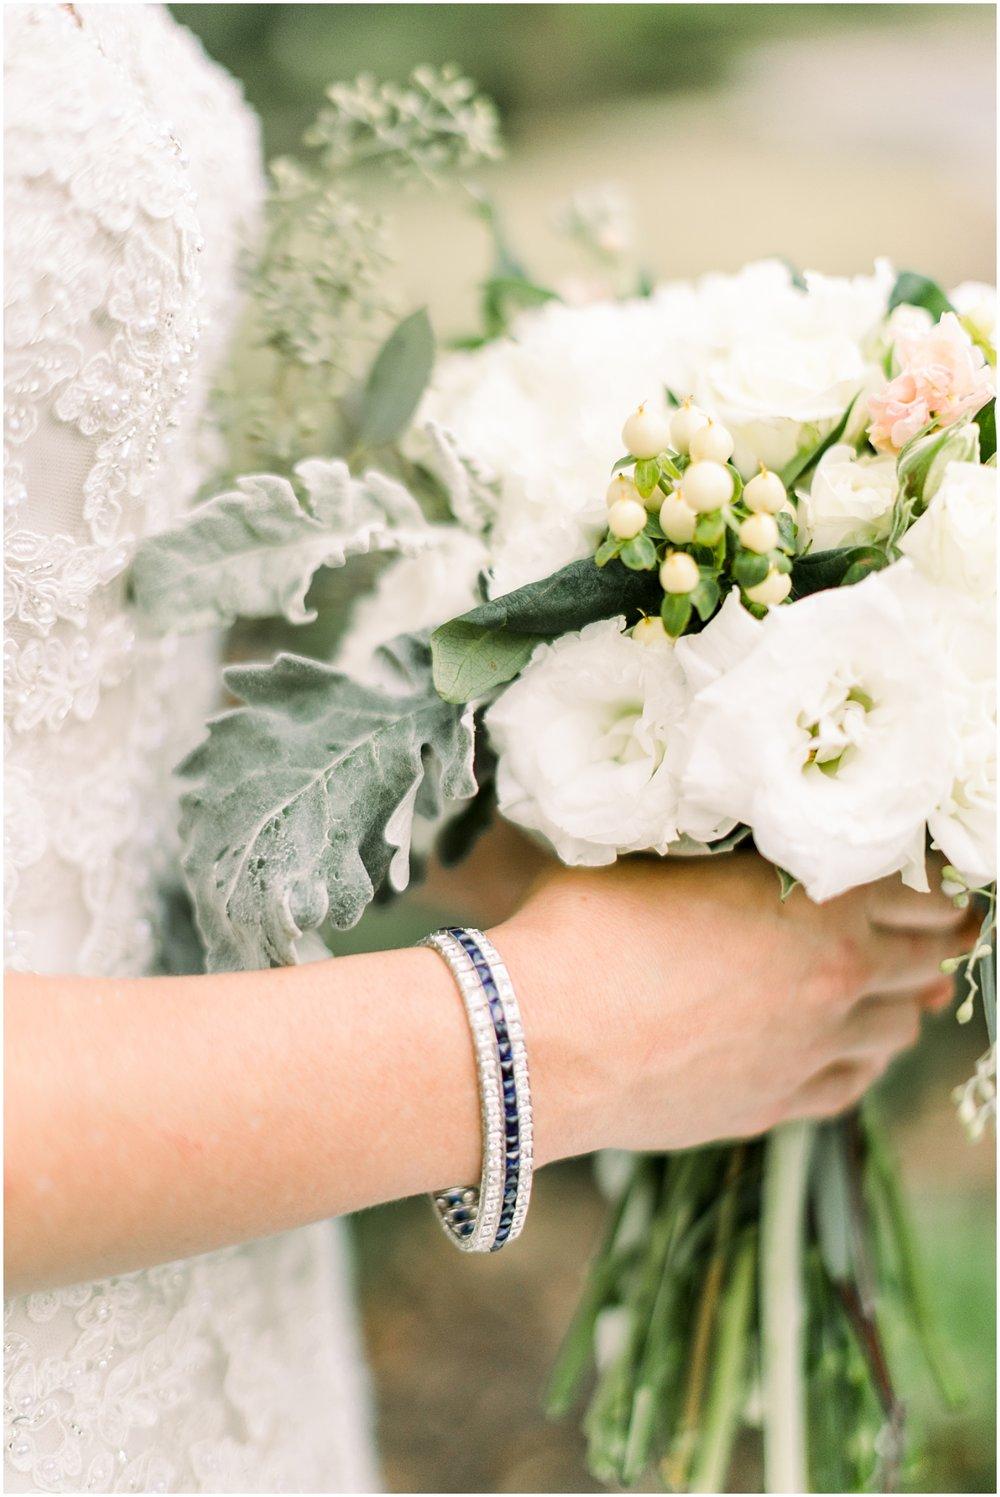 Landfall Bridal Session, Wilmington NC Wedding_Erin L. Taylor Photography_0013.jpg